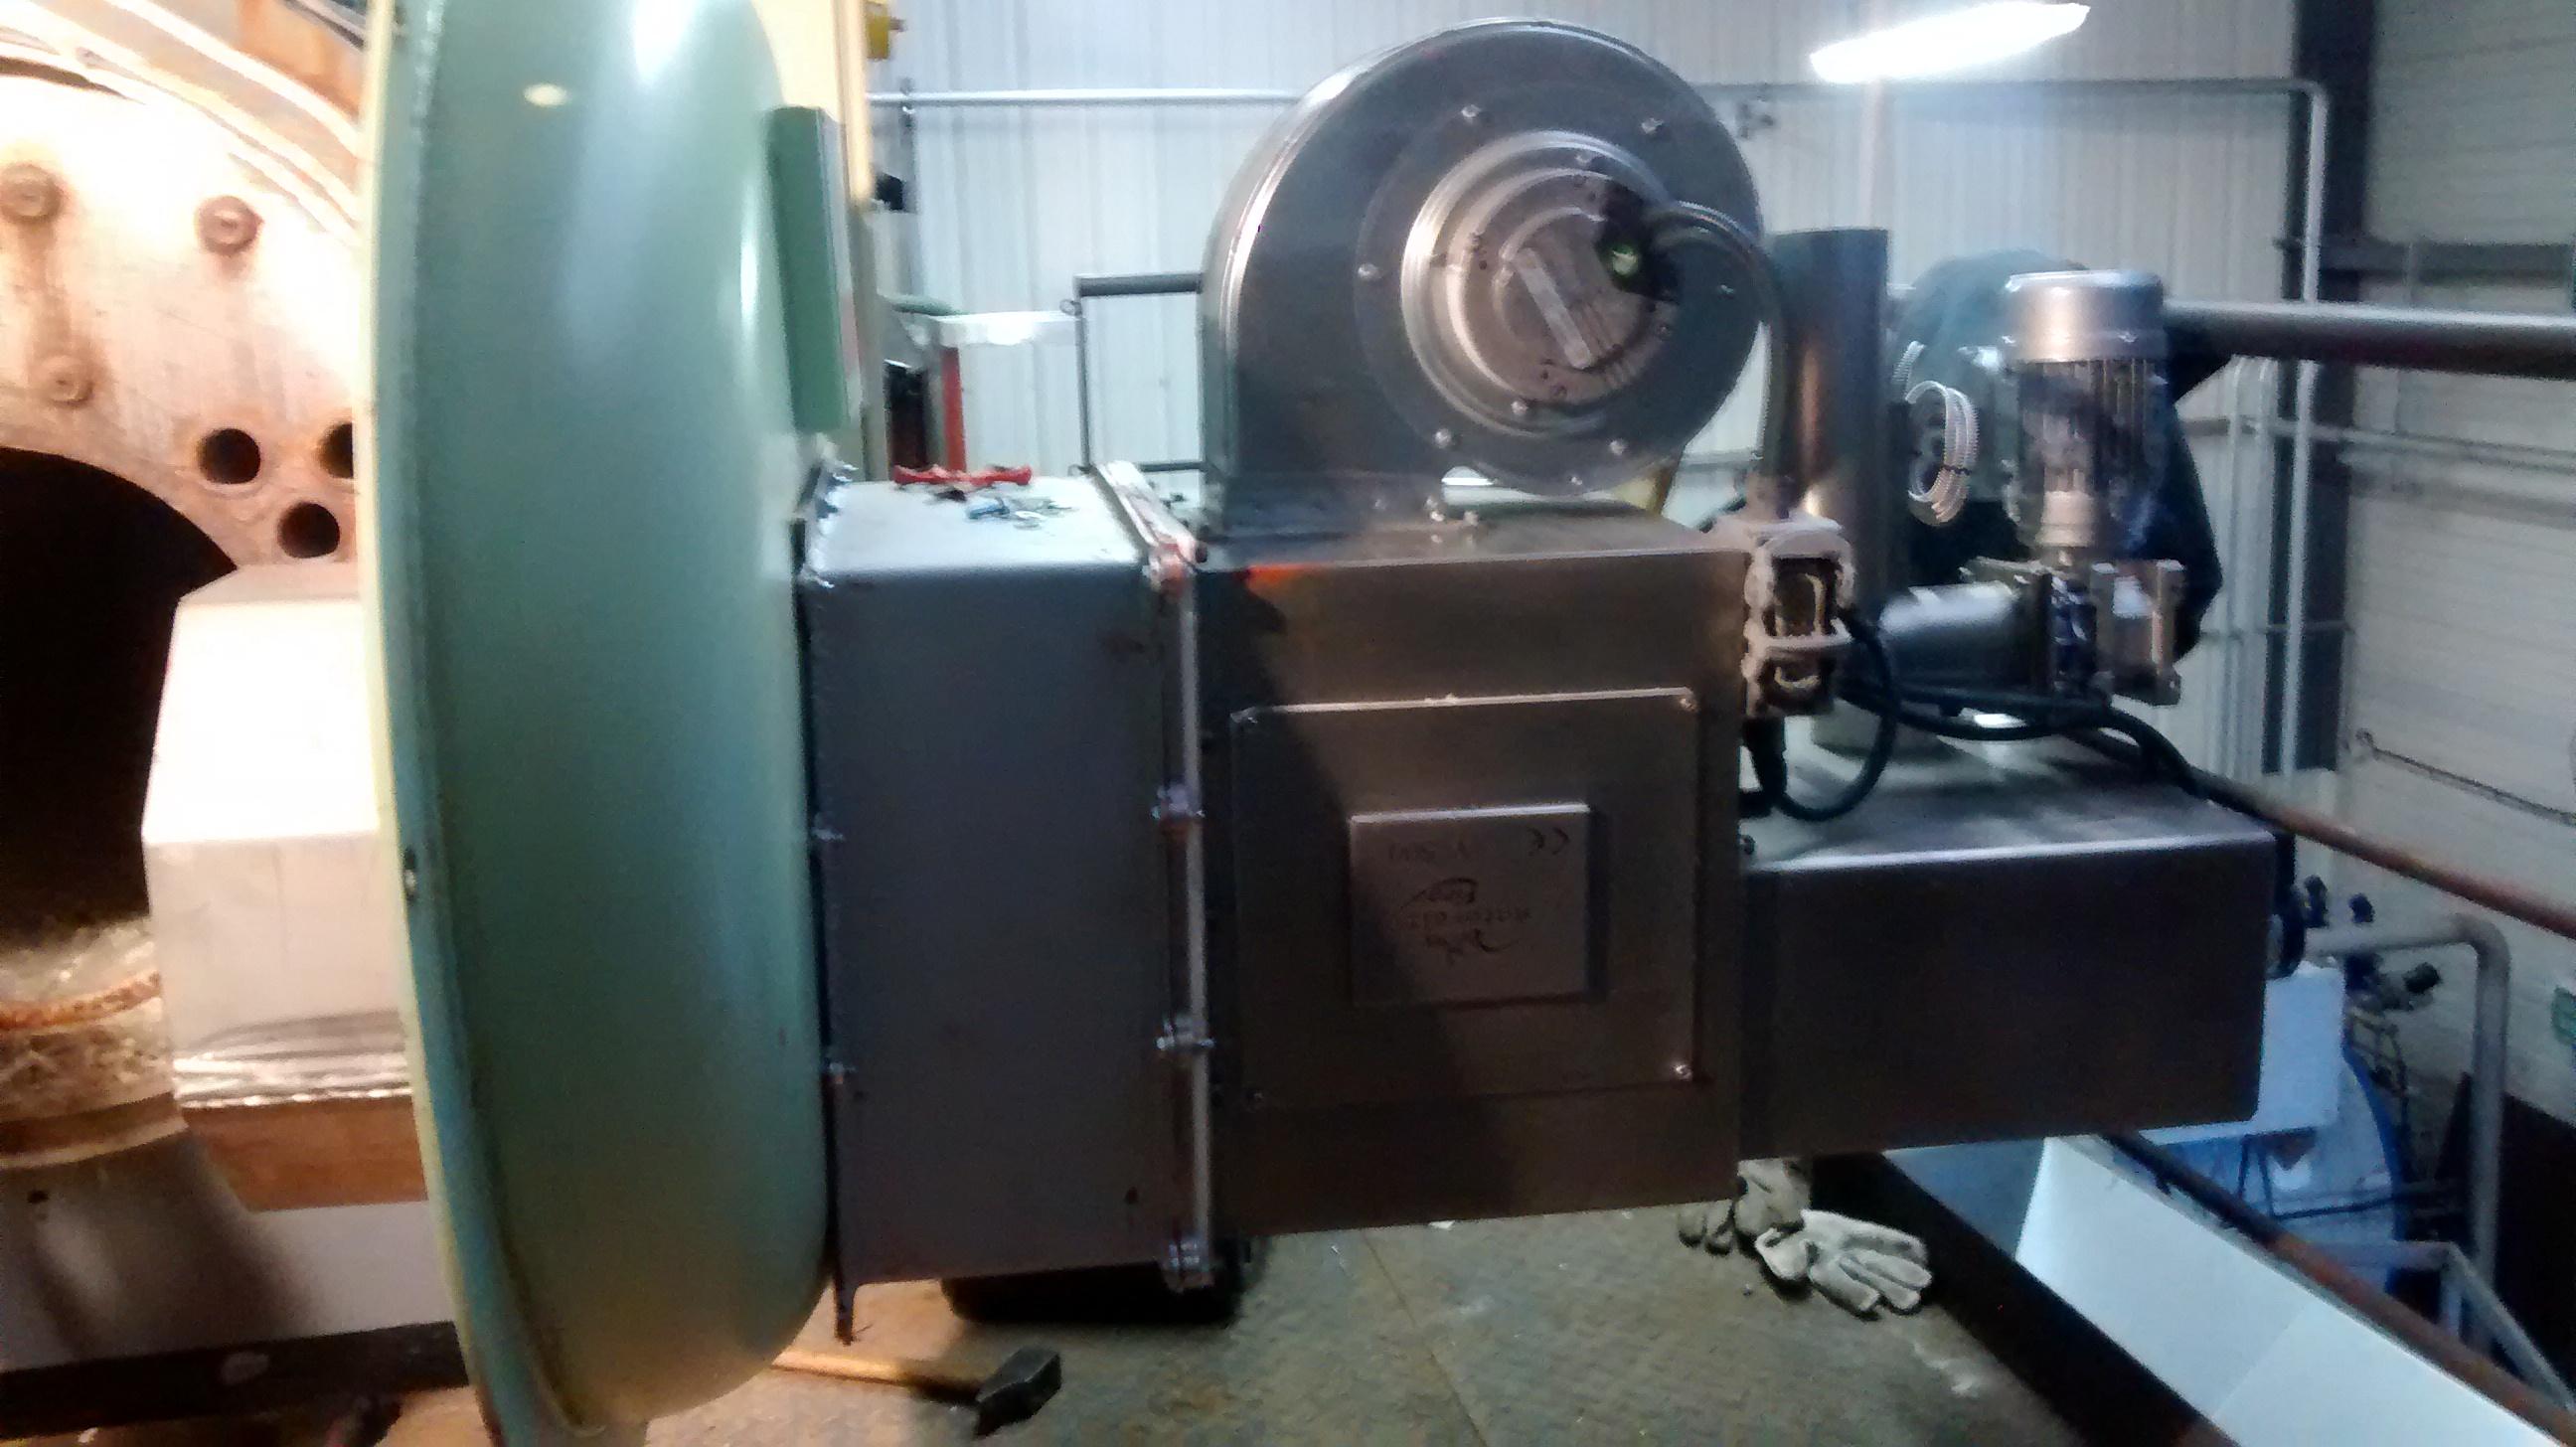 Caldaie termocabi 500kw macchinari usati exapro for Macchinari pellet usati